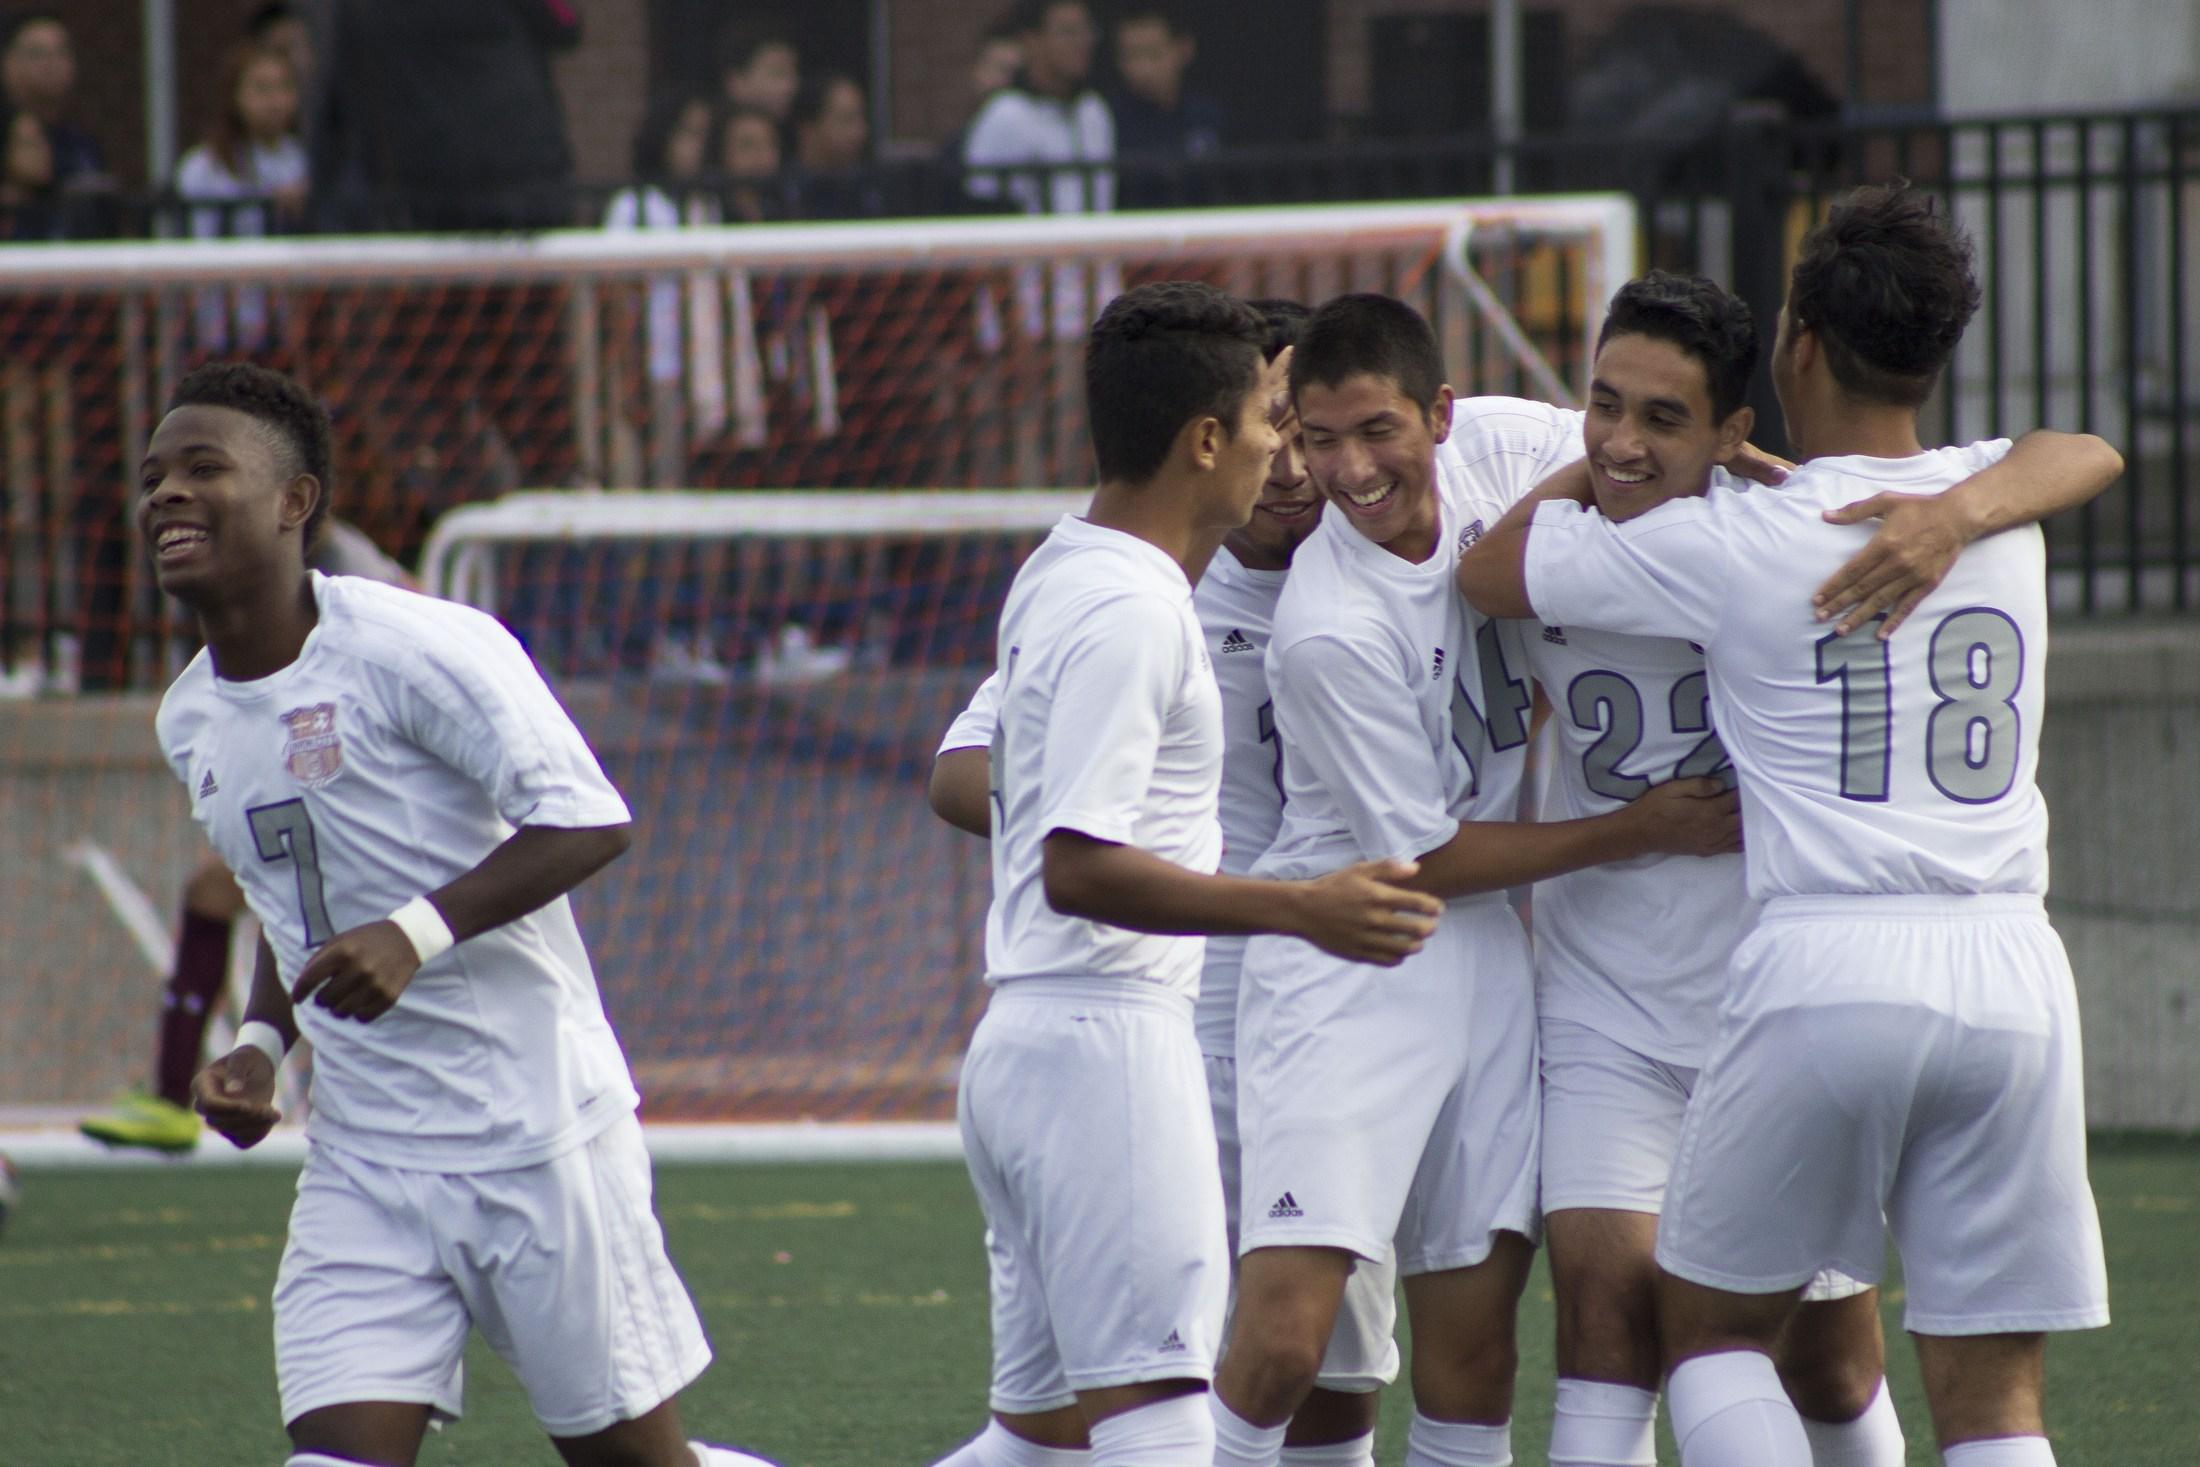 boys soccer team playing